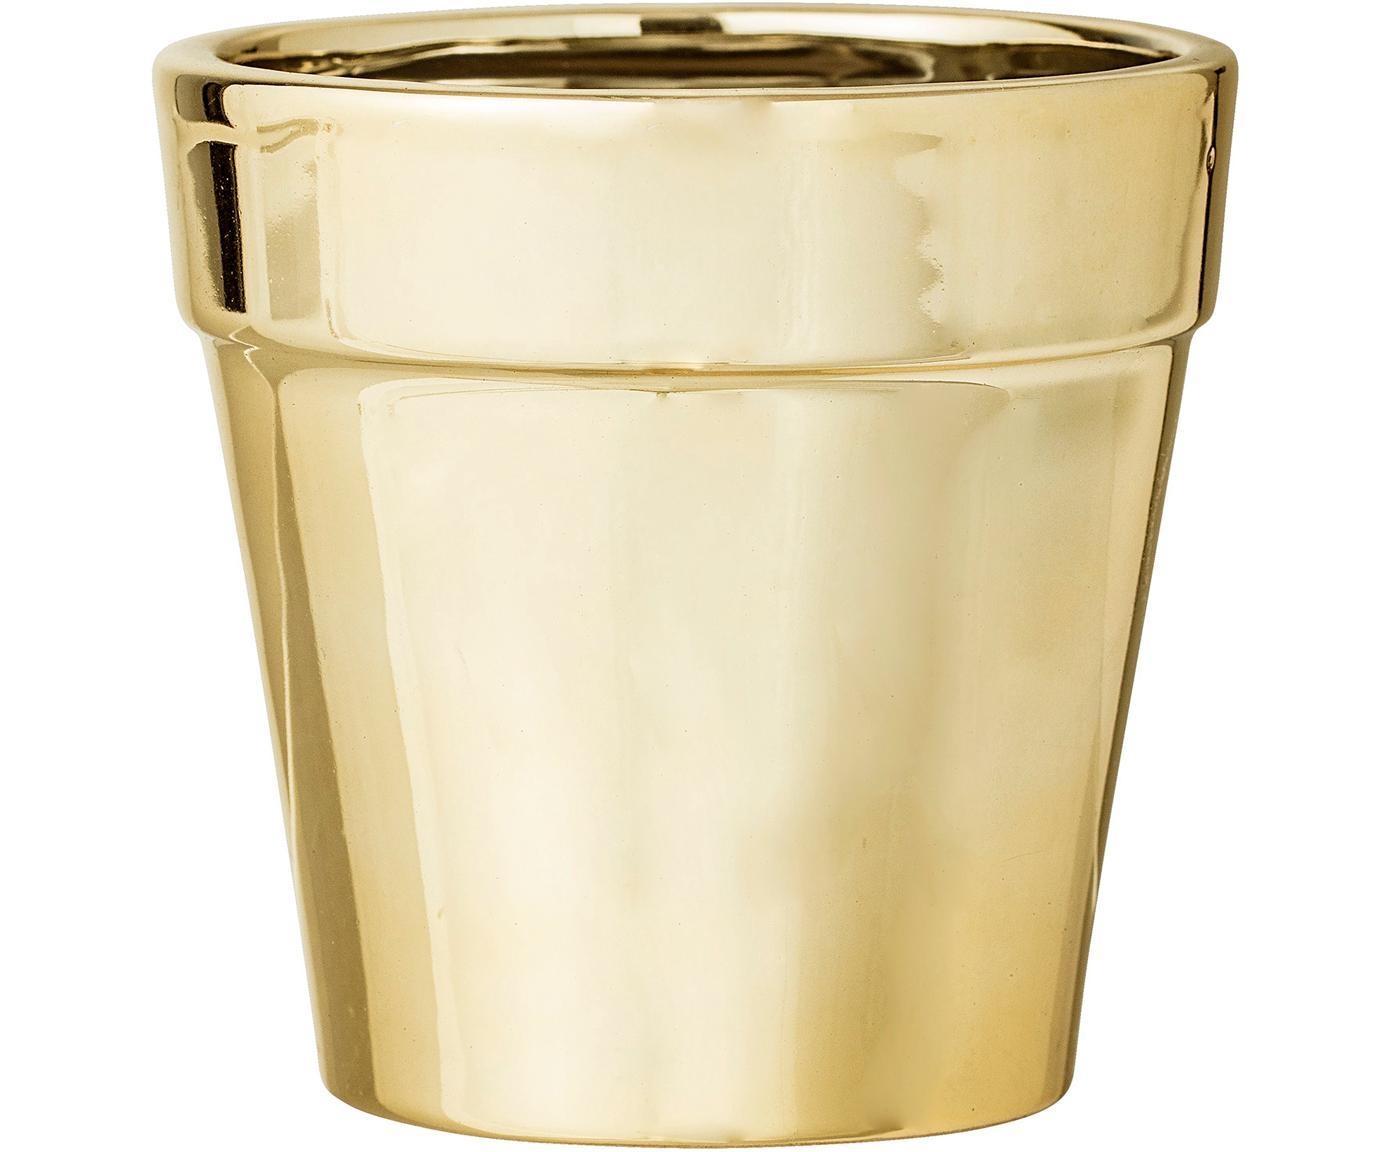 Portavaso dorato brillante Gladys, Gres, Dorato, Ø 10 x Alt. 10 cm